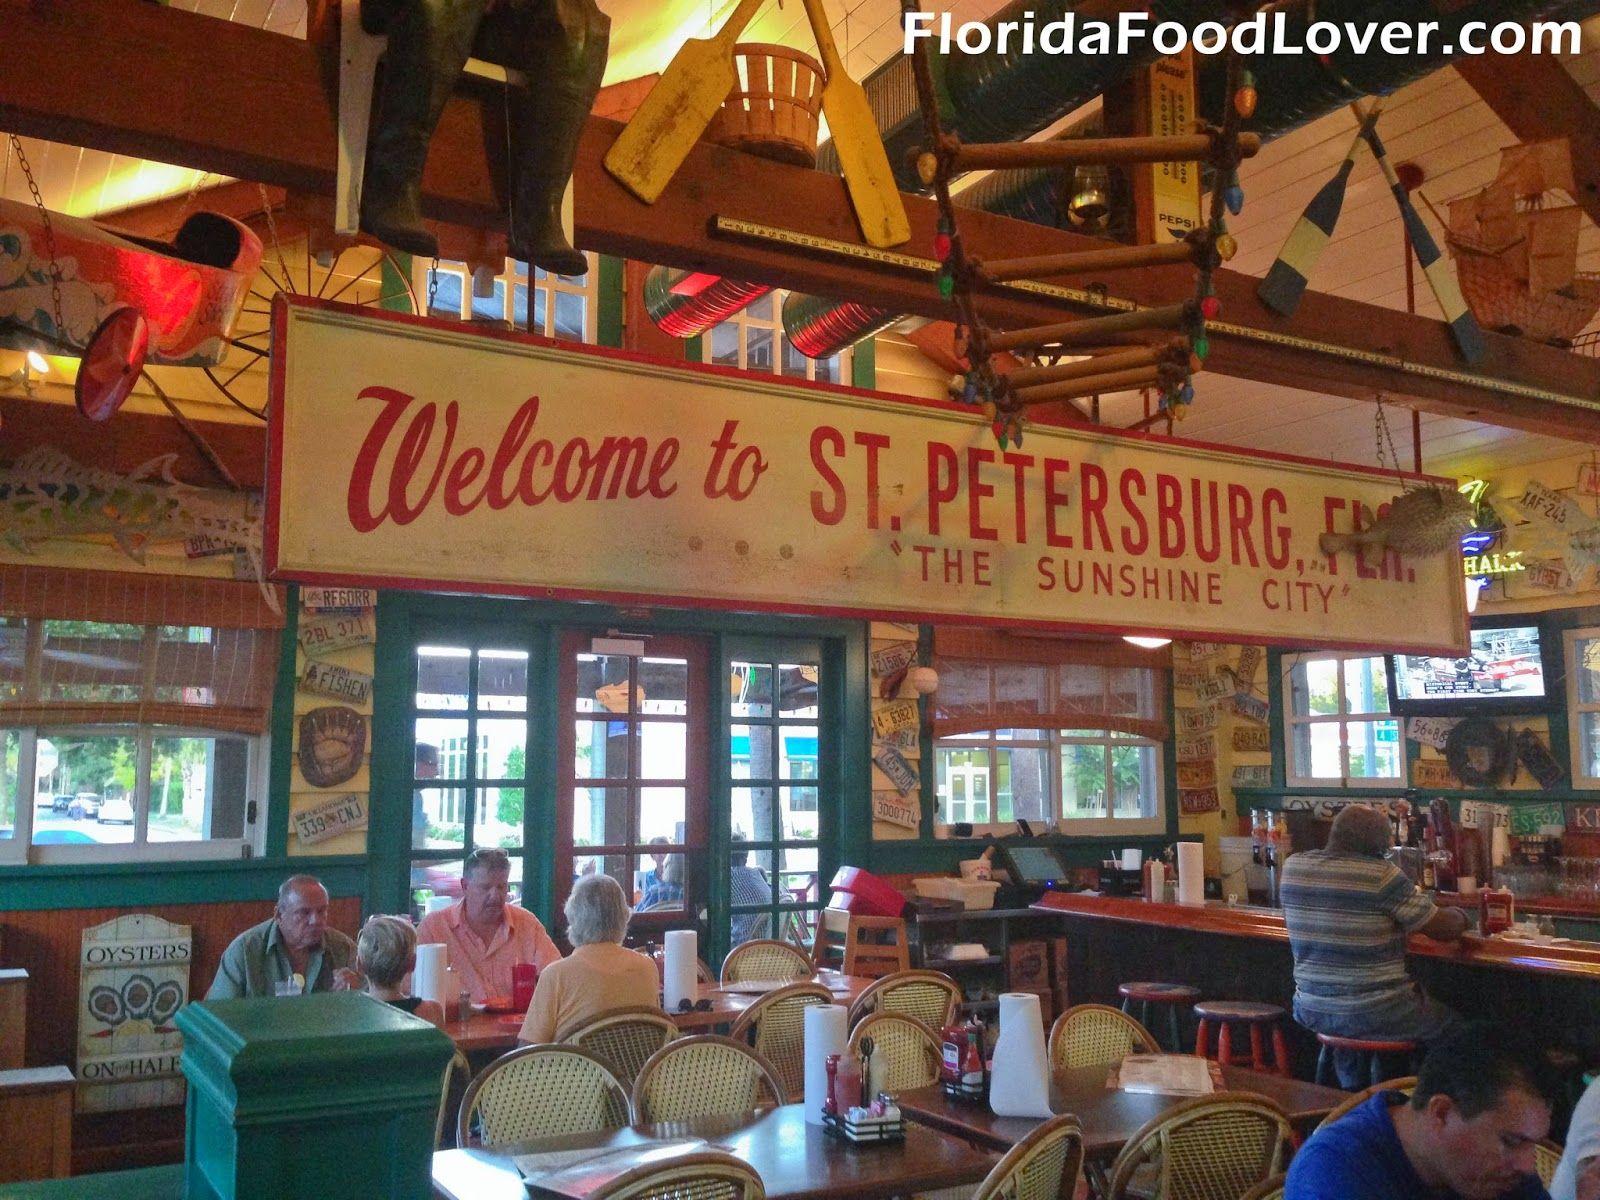 Fourth Street Shrimp Store The Getaway Saint Petersburg Fl Mexico Cruise St Petersburg Western Caribbean Cruise